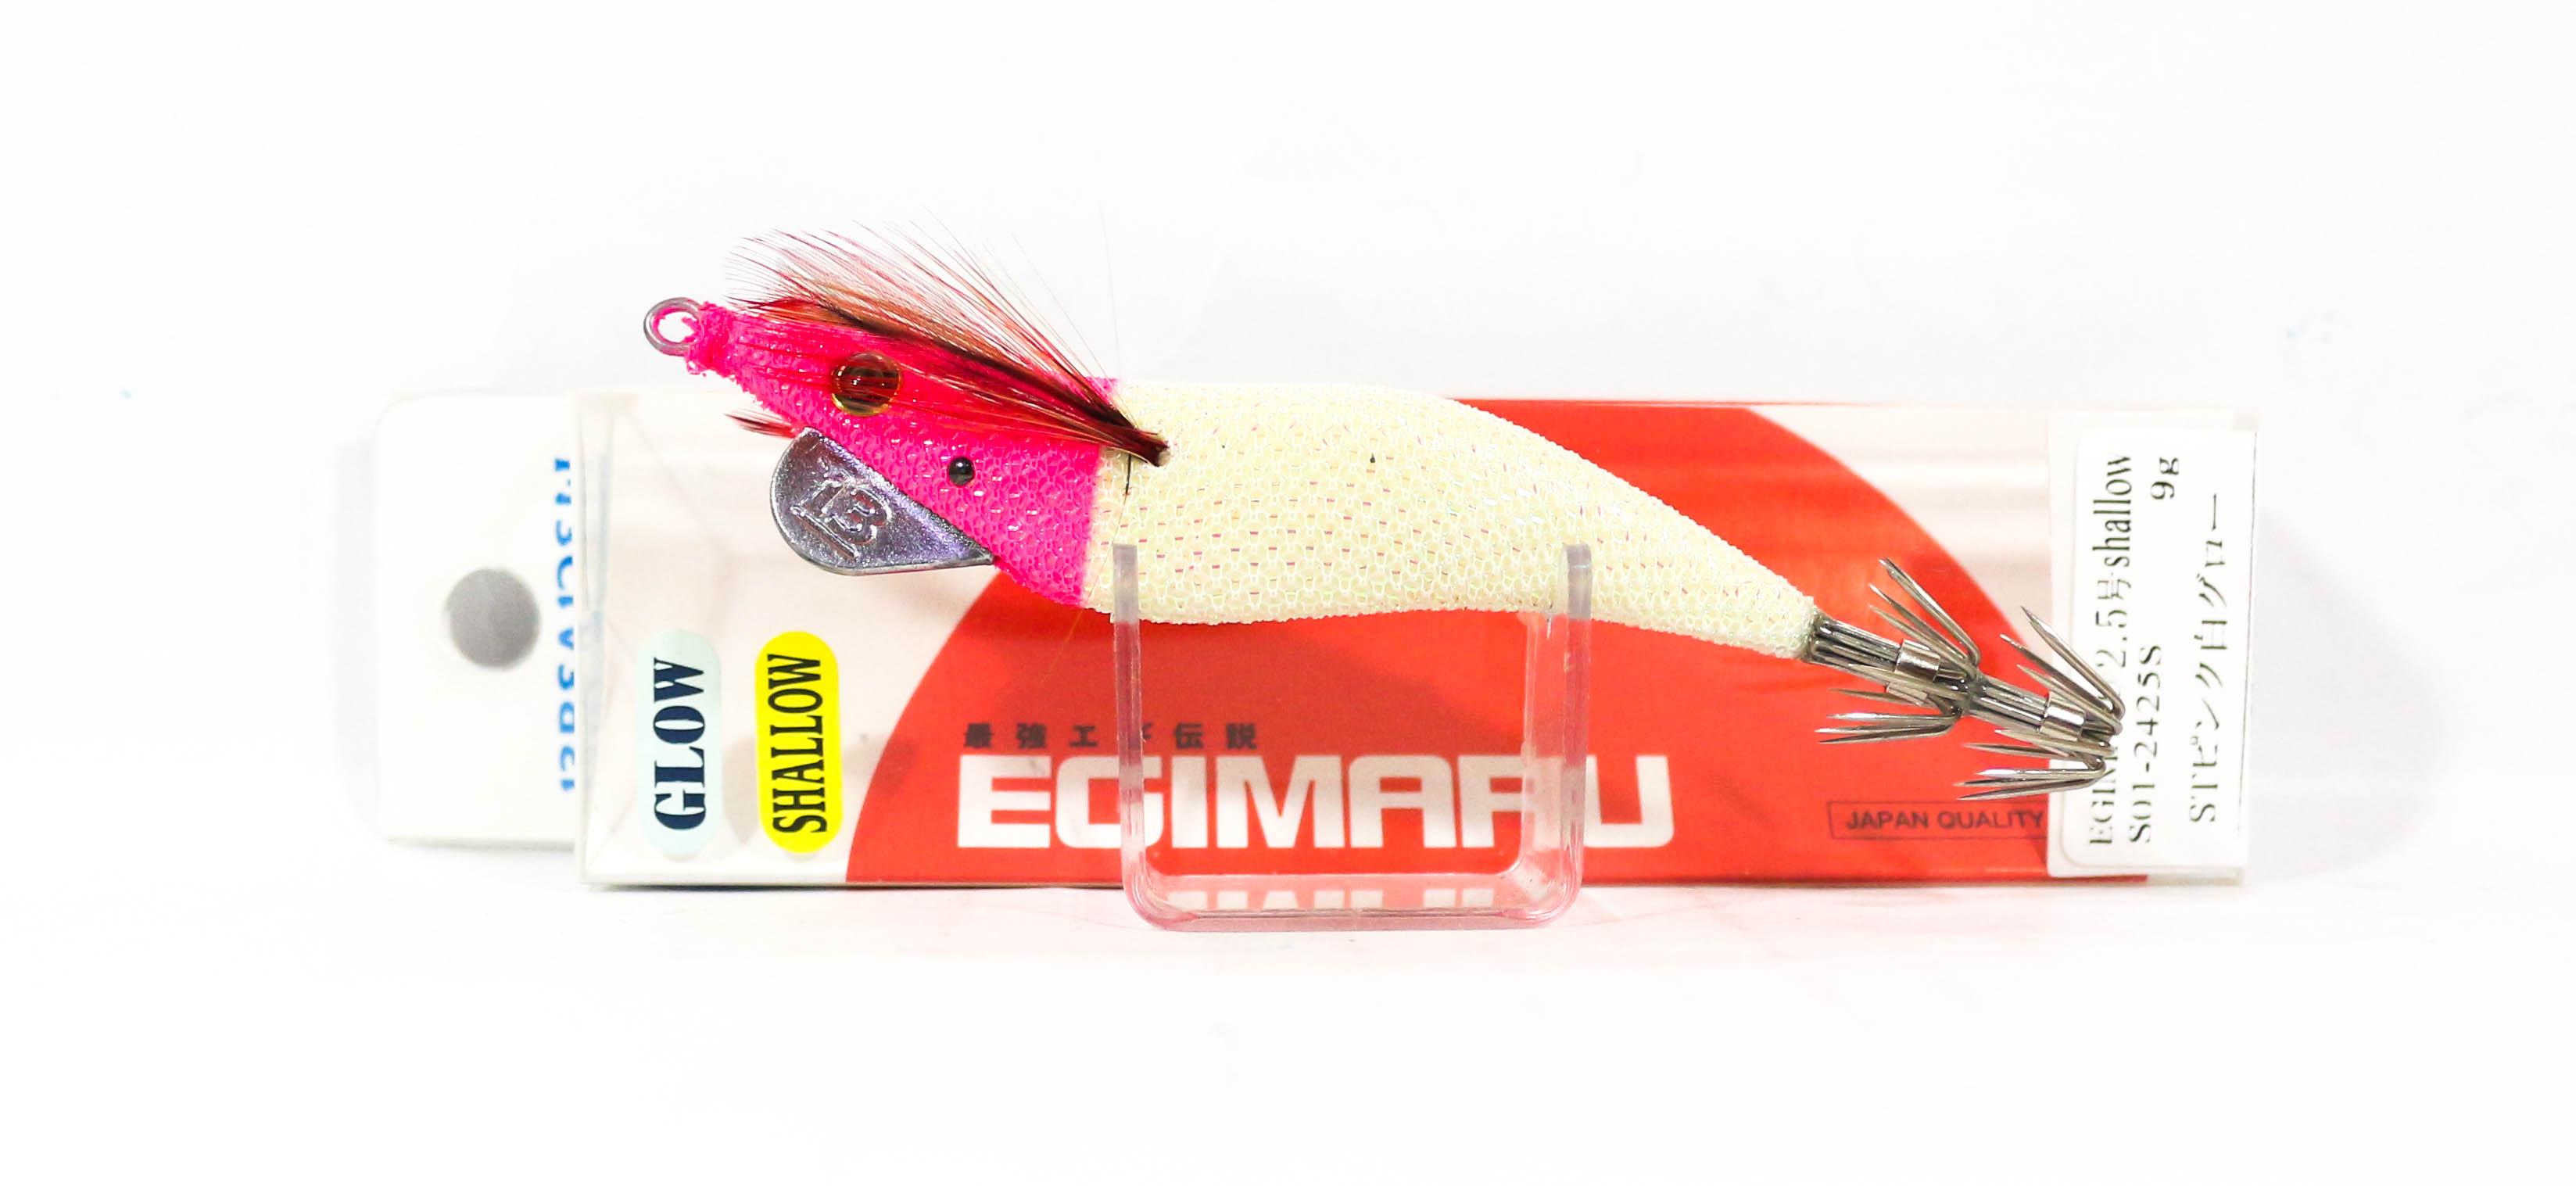 Breaden Egimaru Squid Jig Sinking Lure 2.5S S01-2425S (2565)